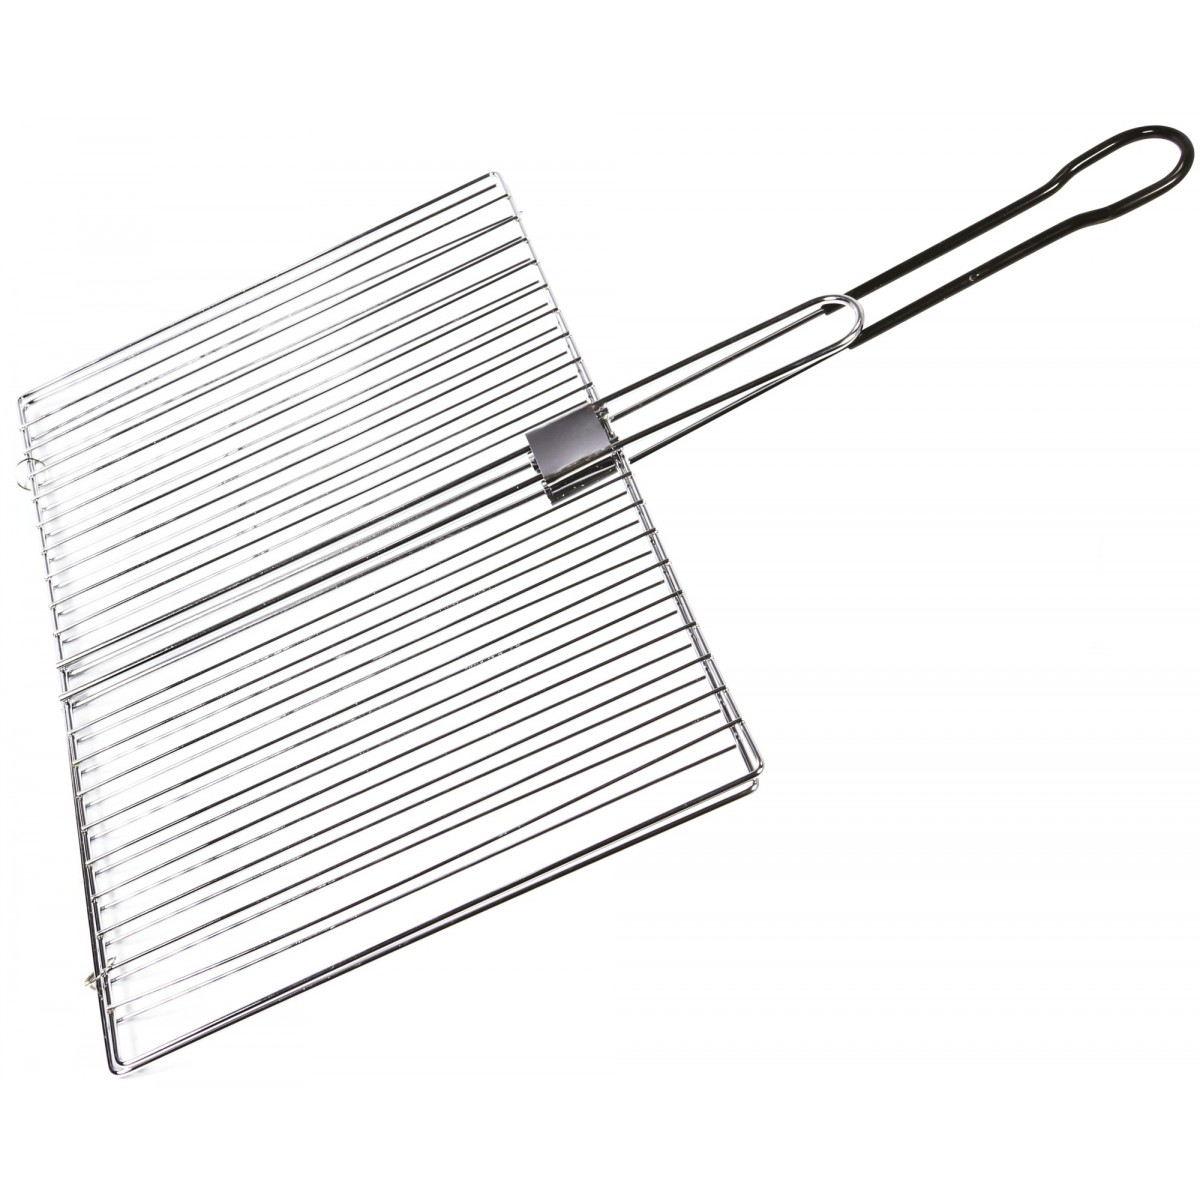 Gril double Cao Camping - Longueur grille 41 cm